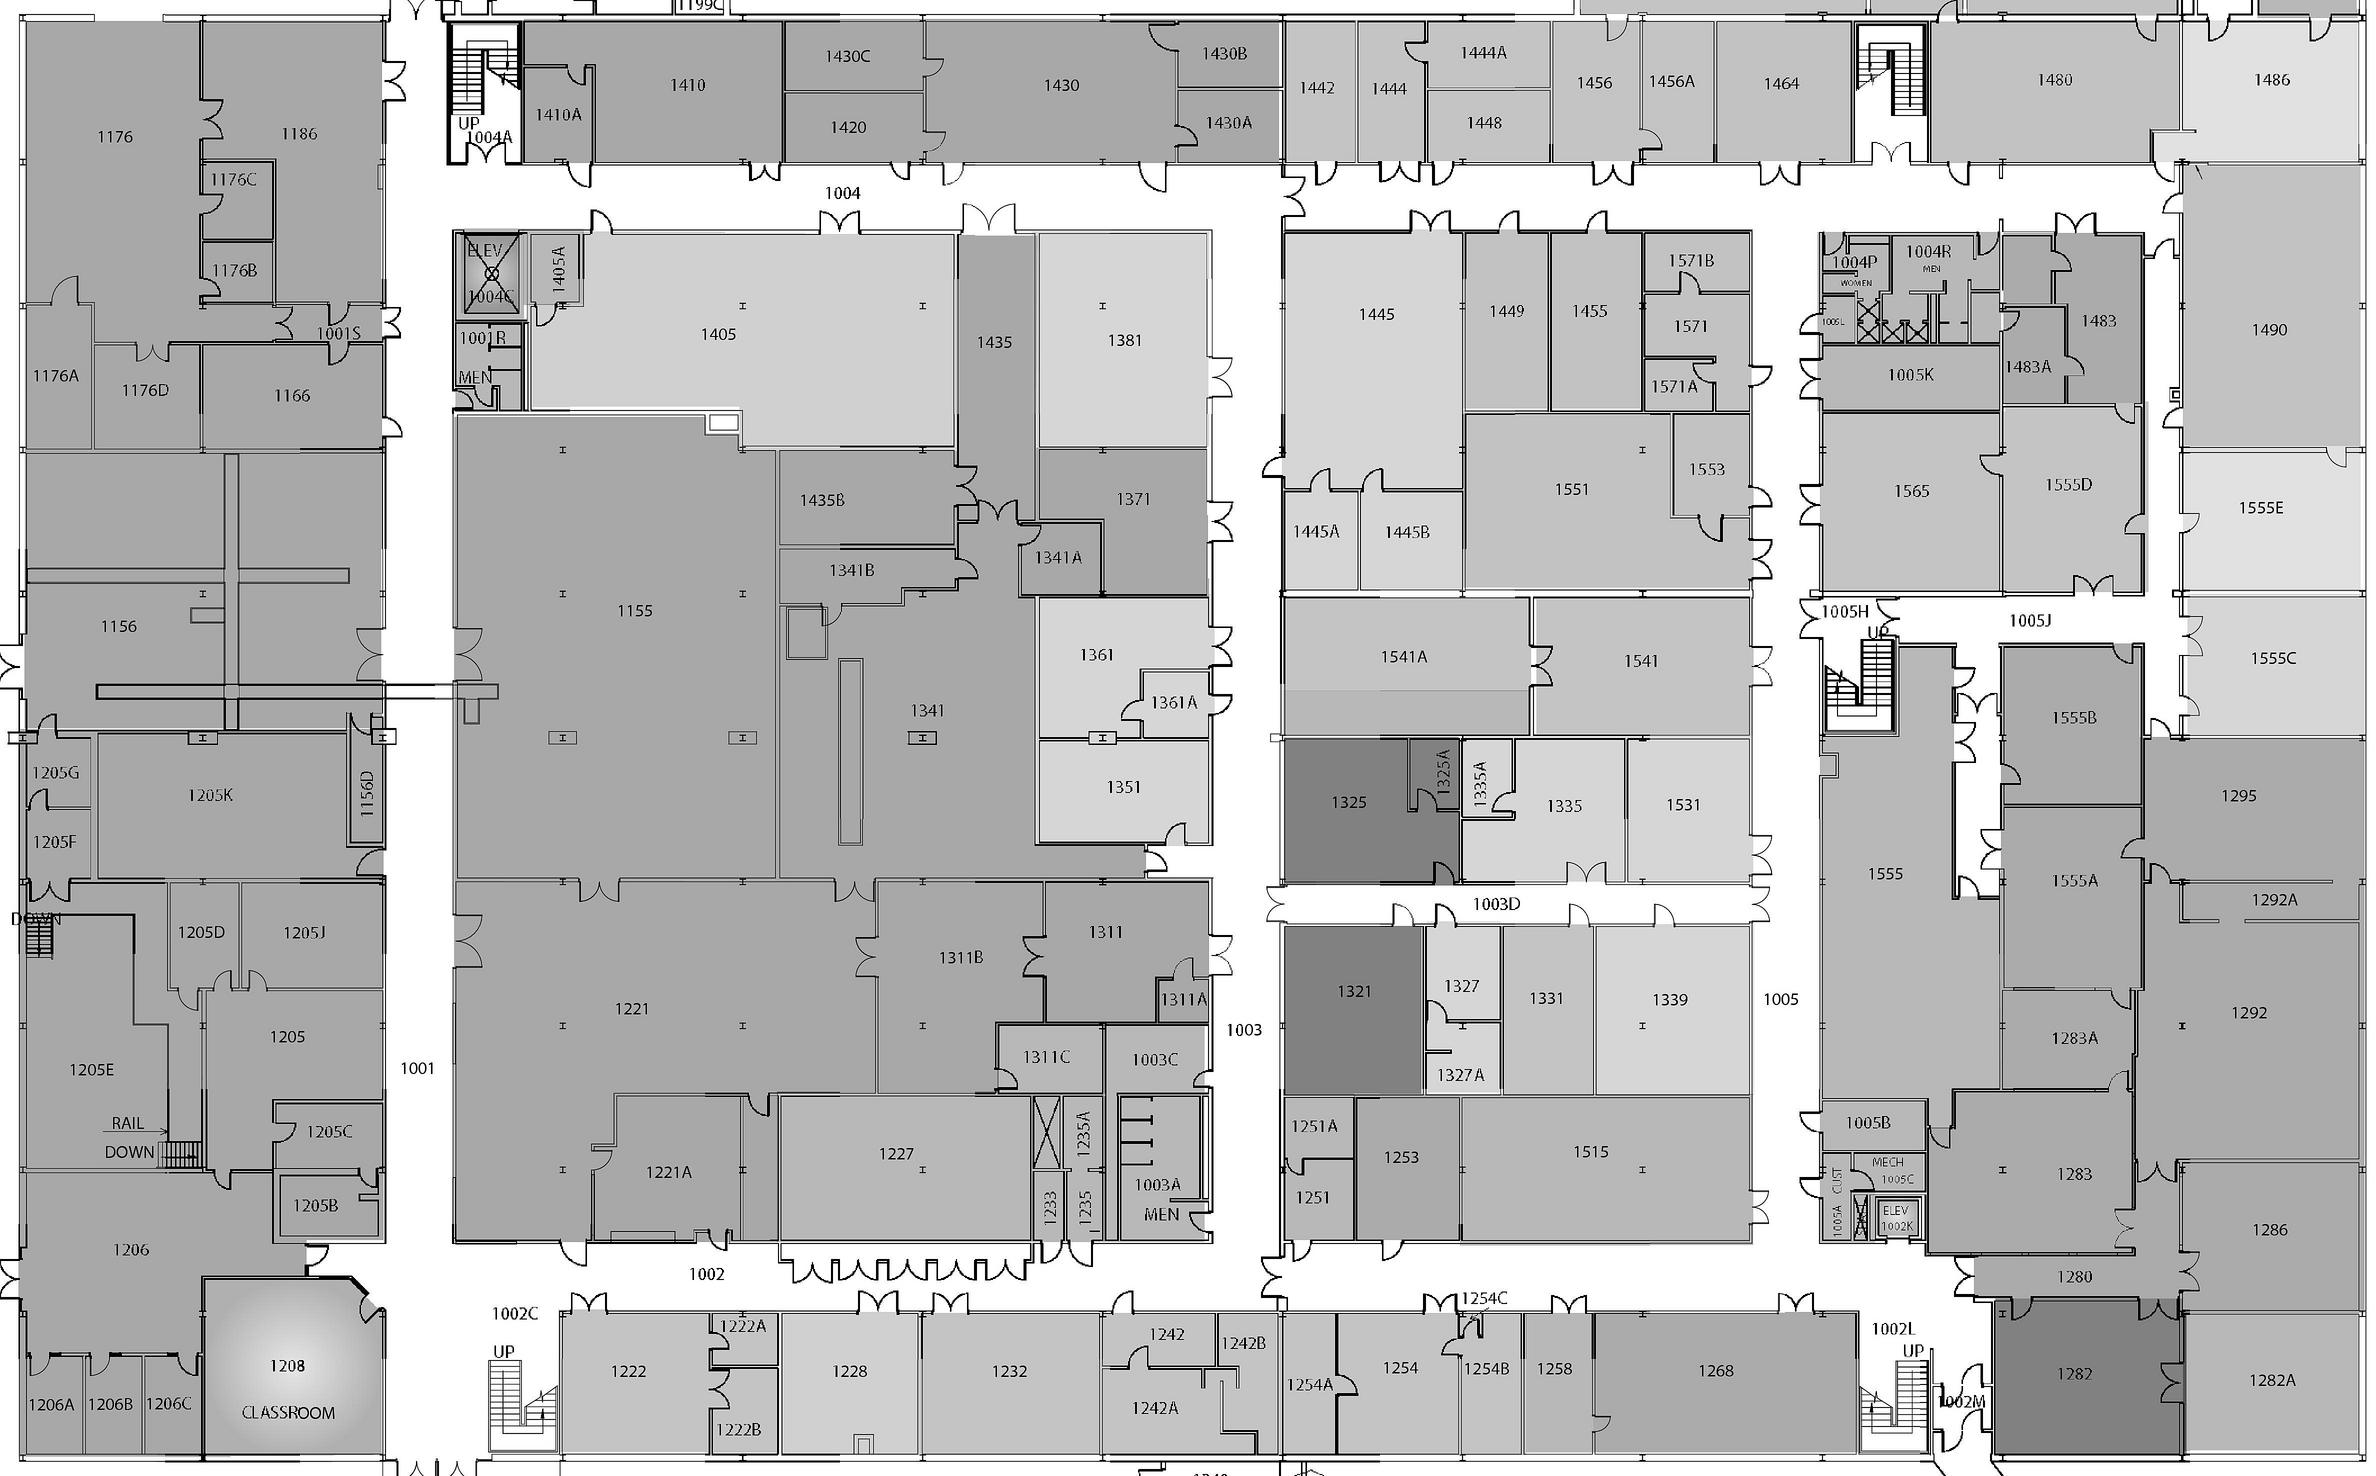 www/floormap/meb1fl-5.jpg